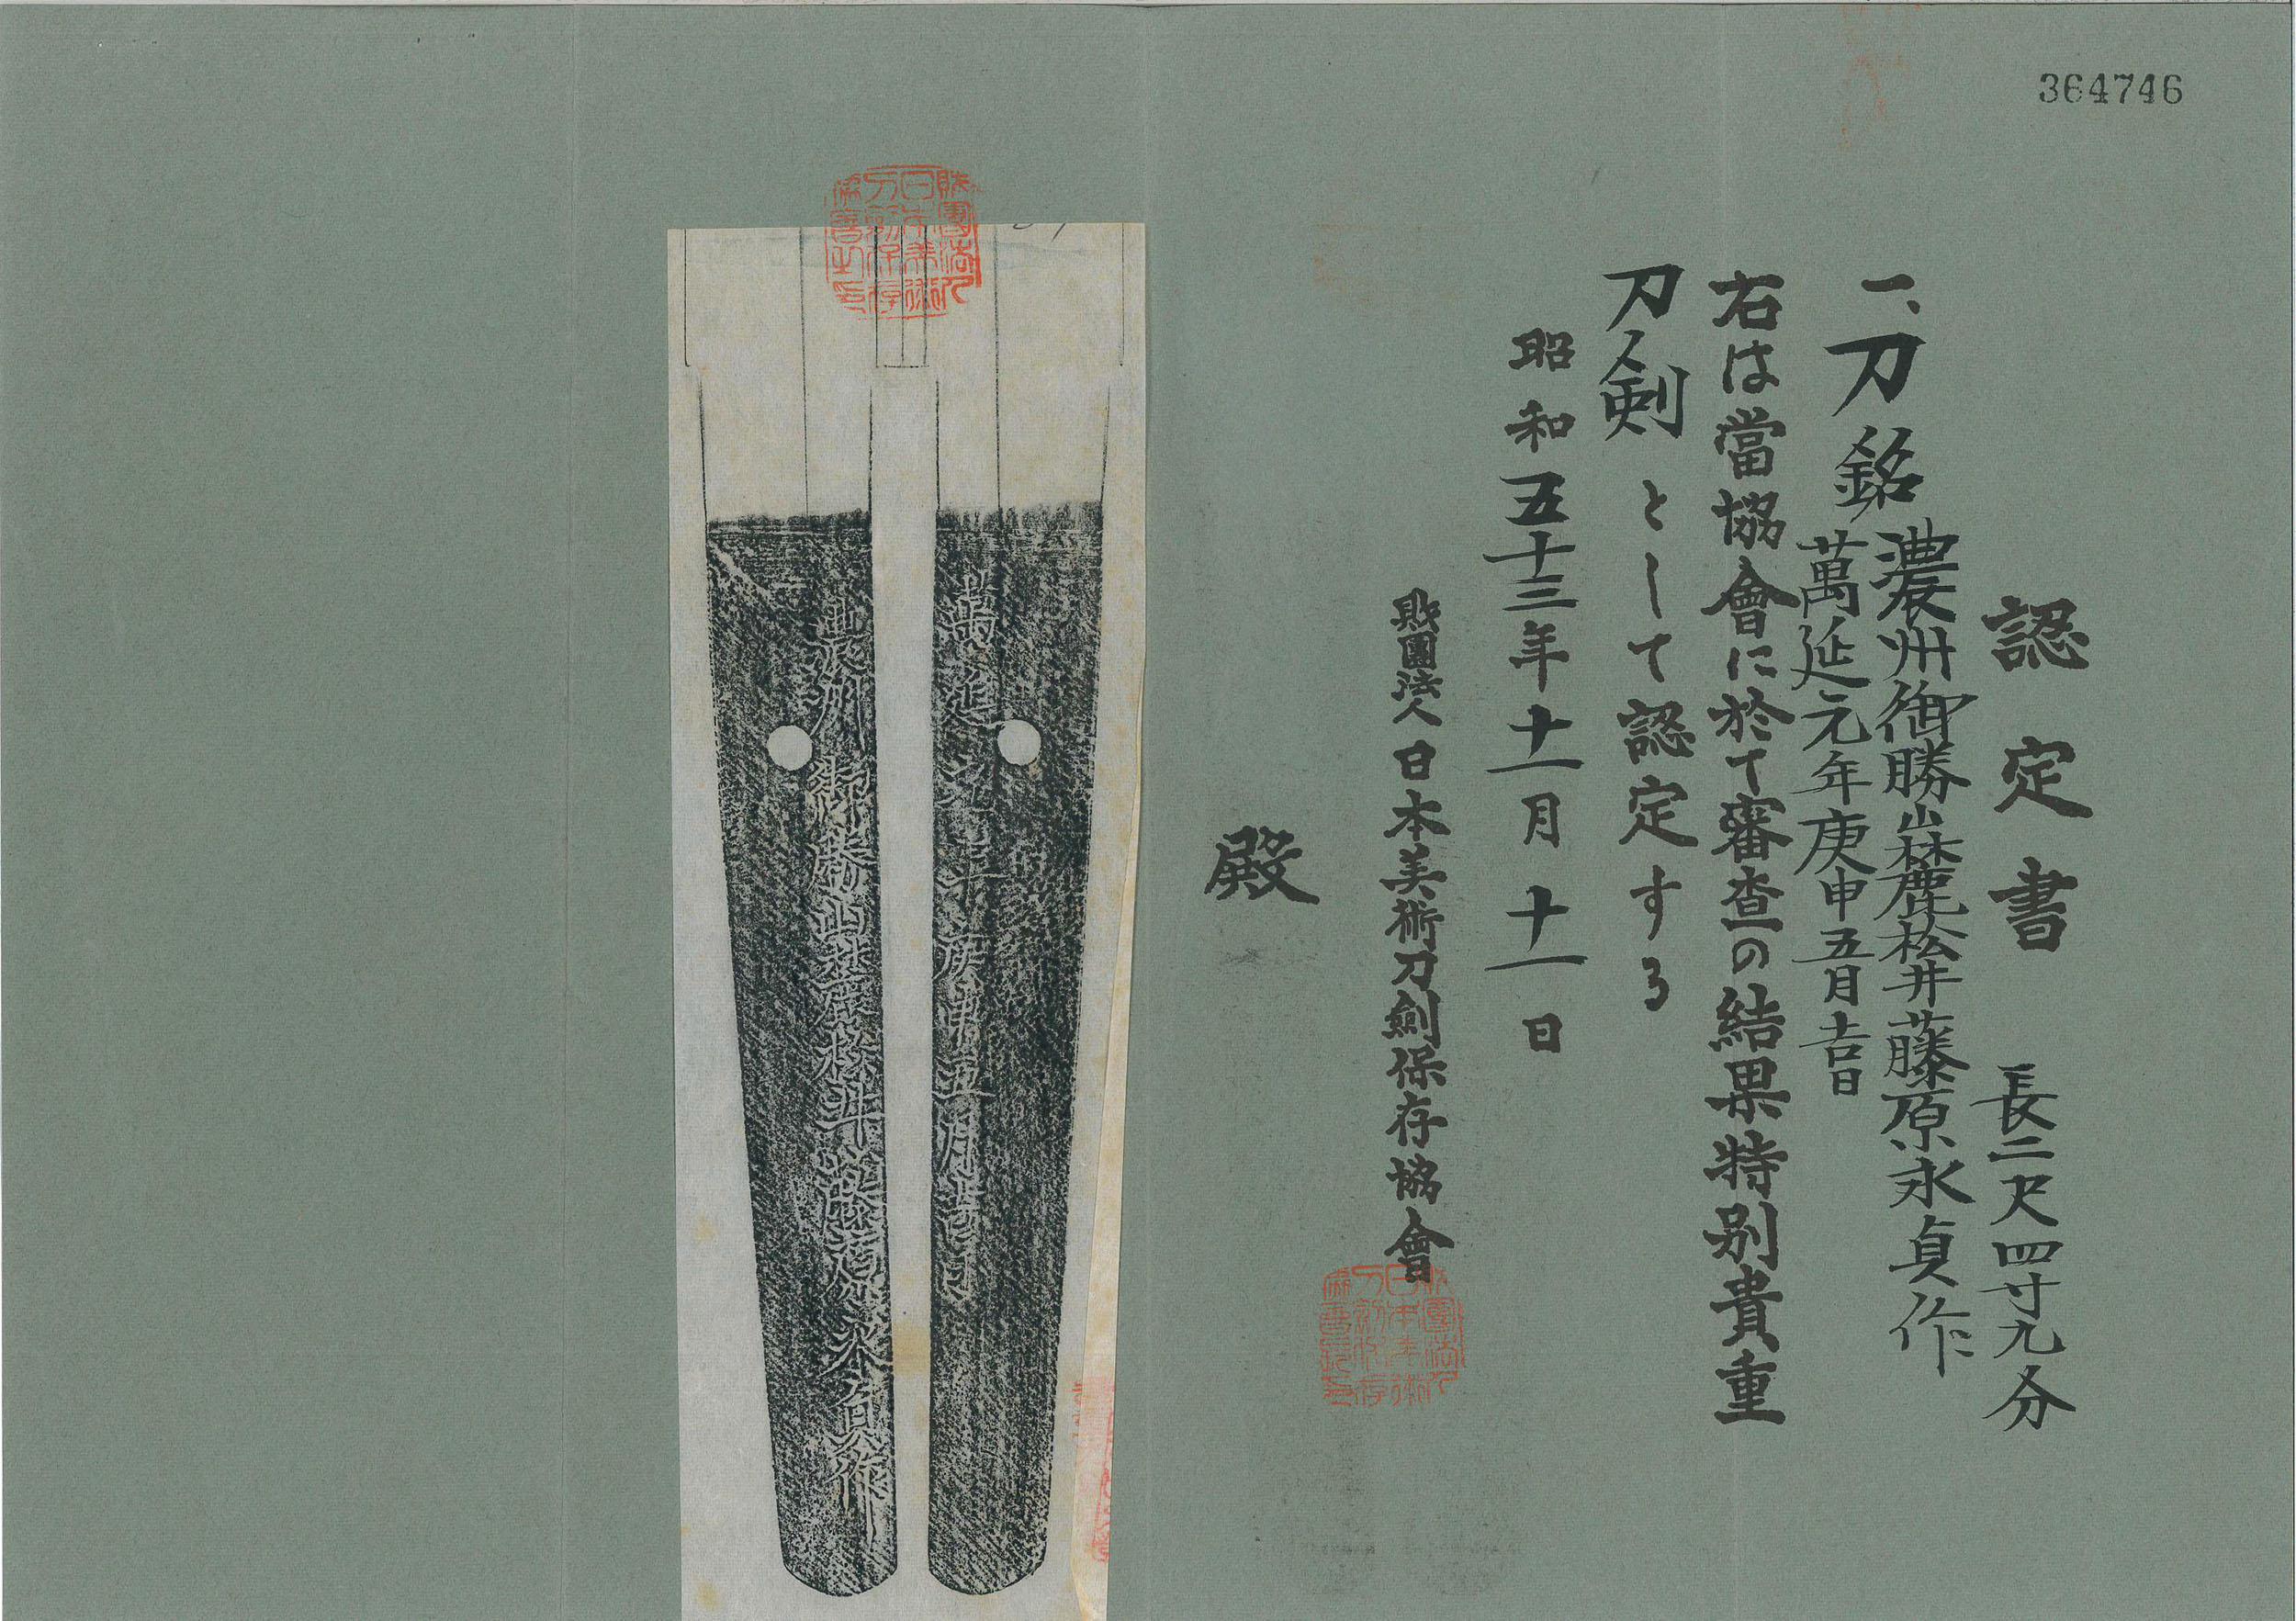 01-1134